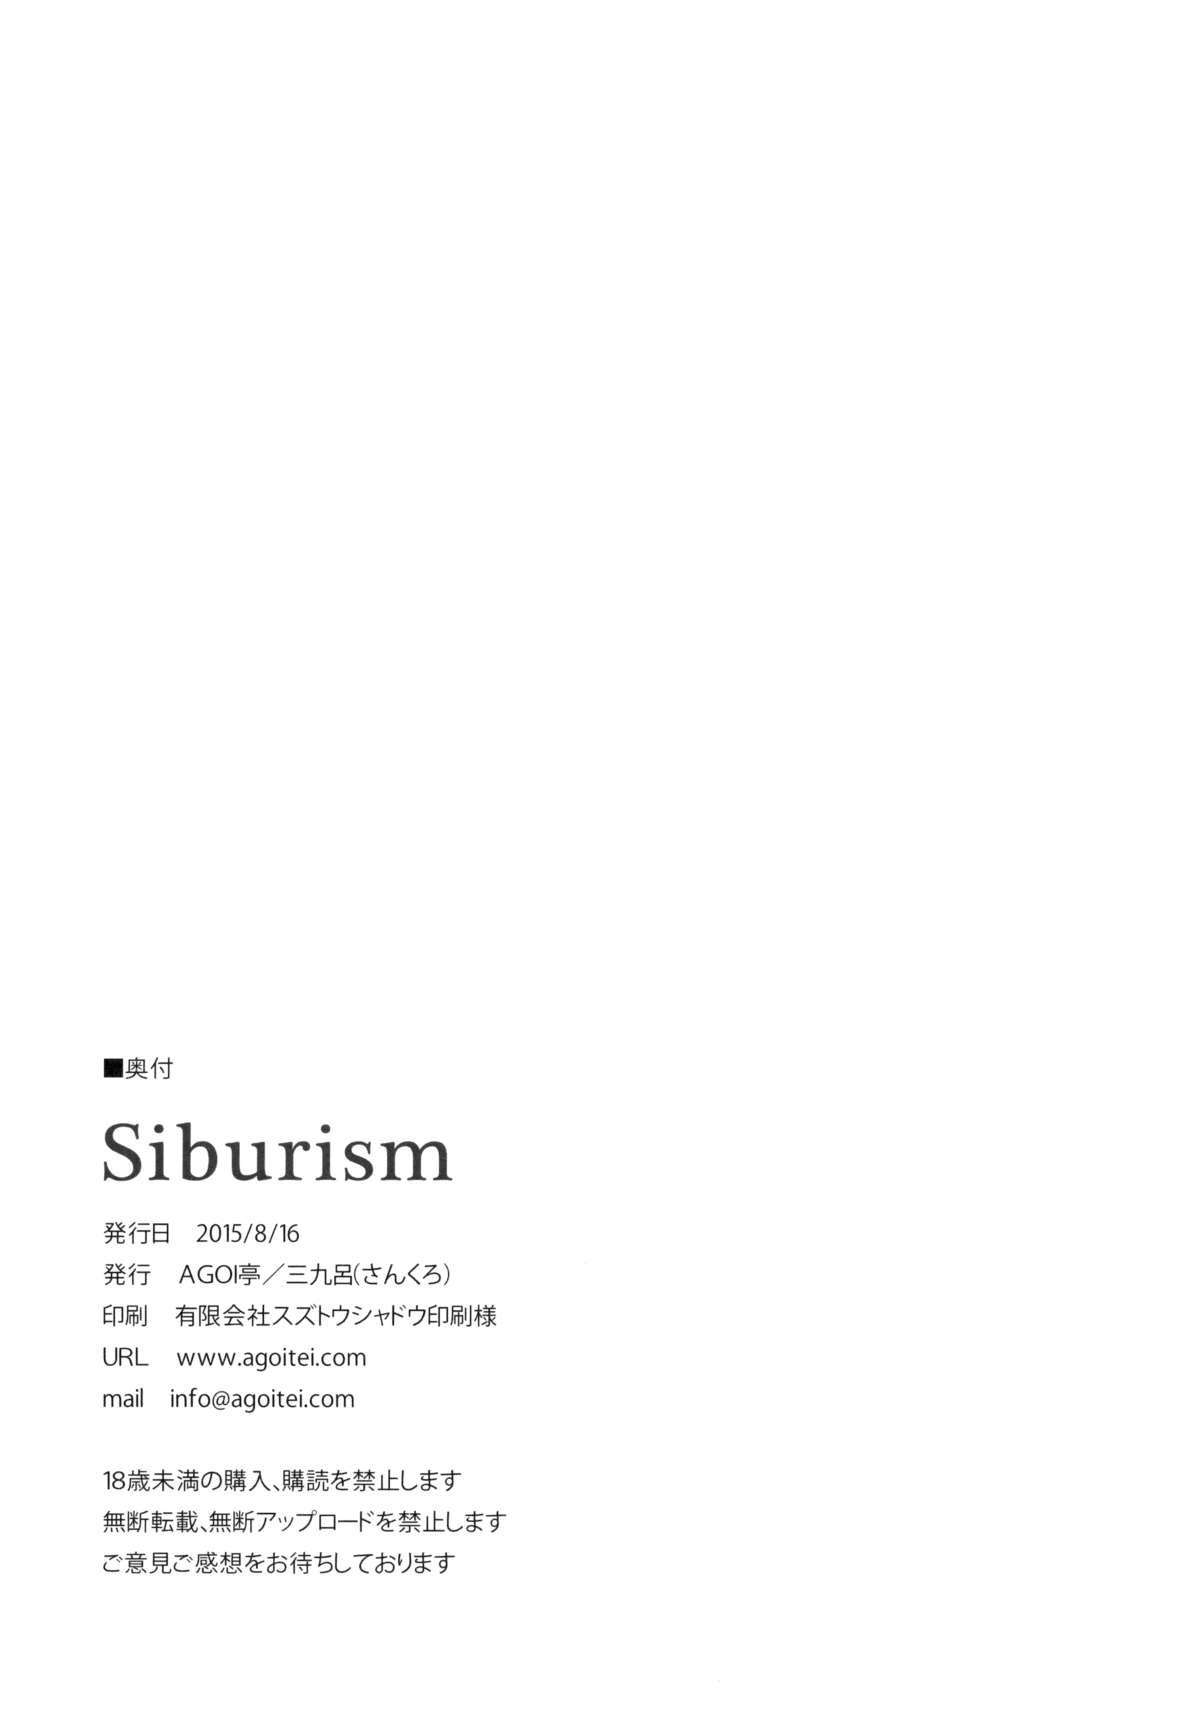 Shiburism 24